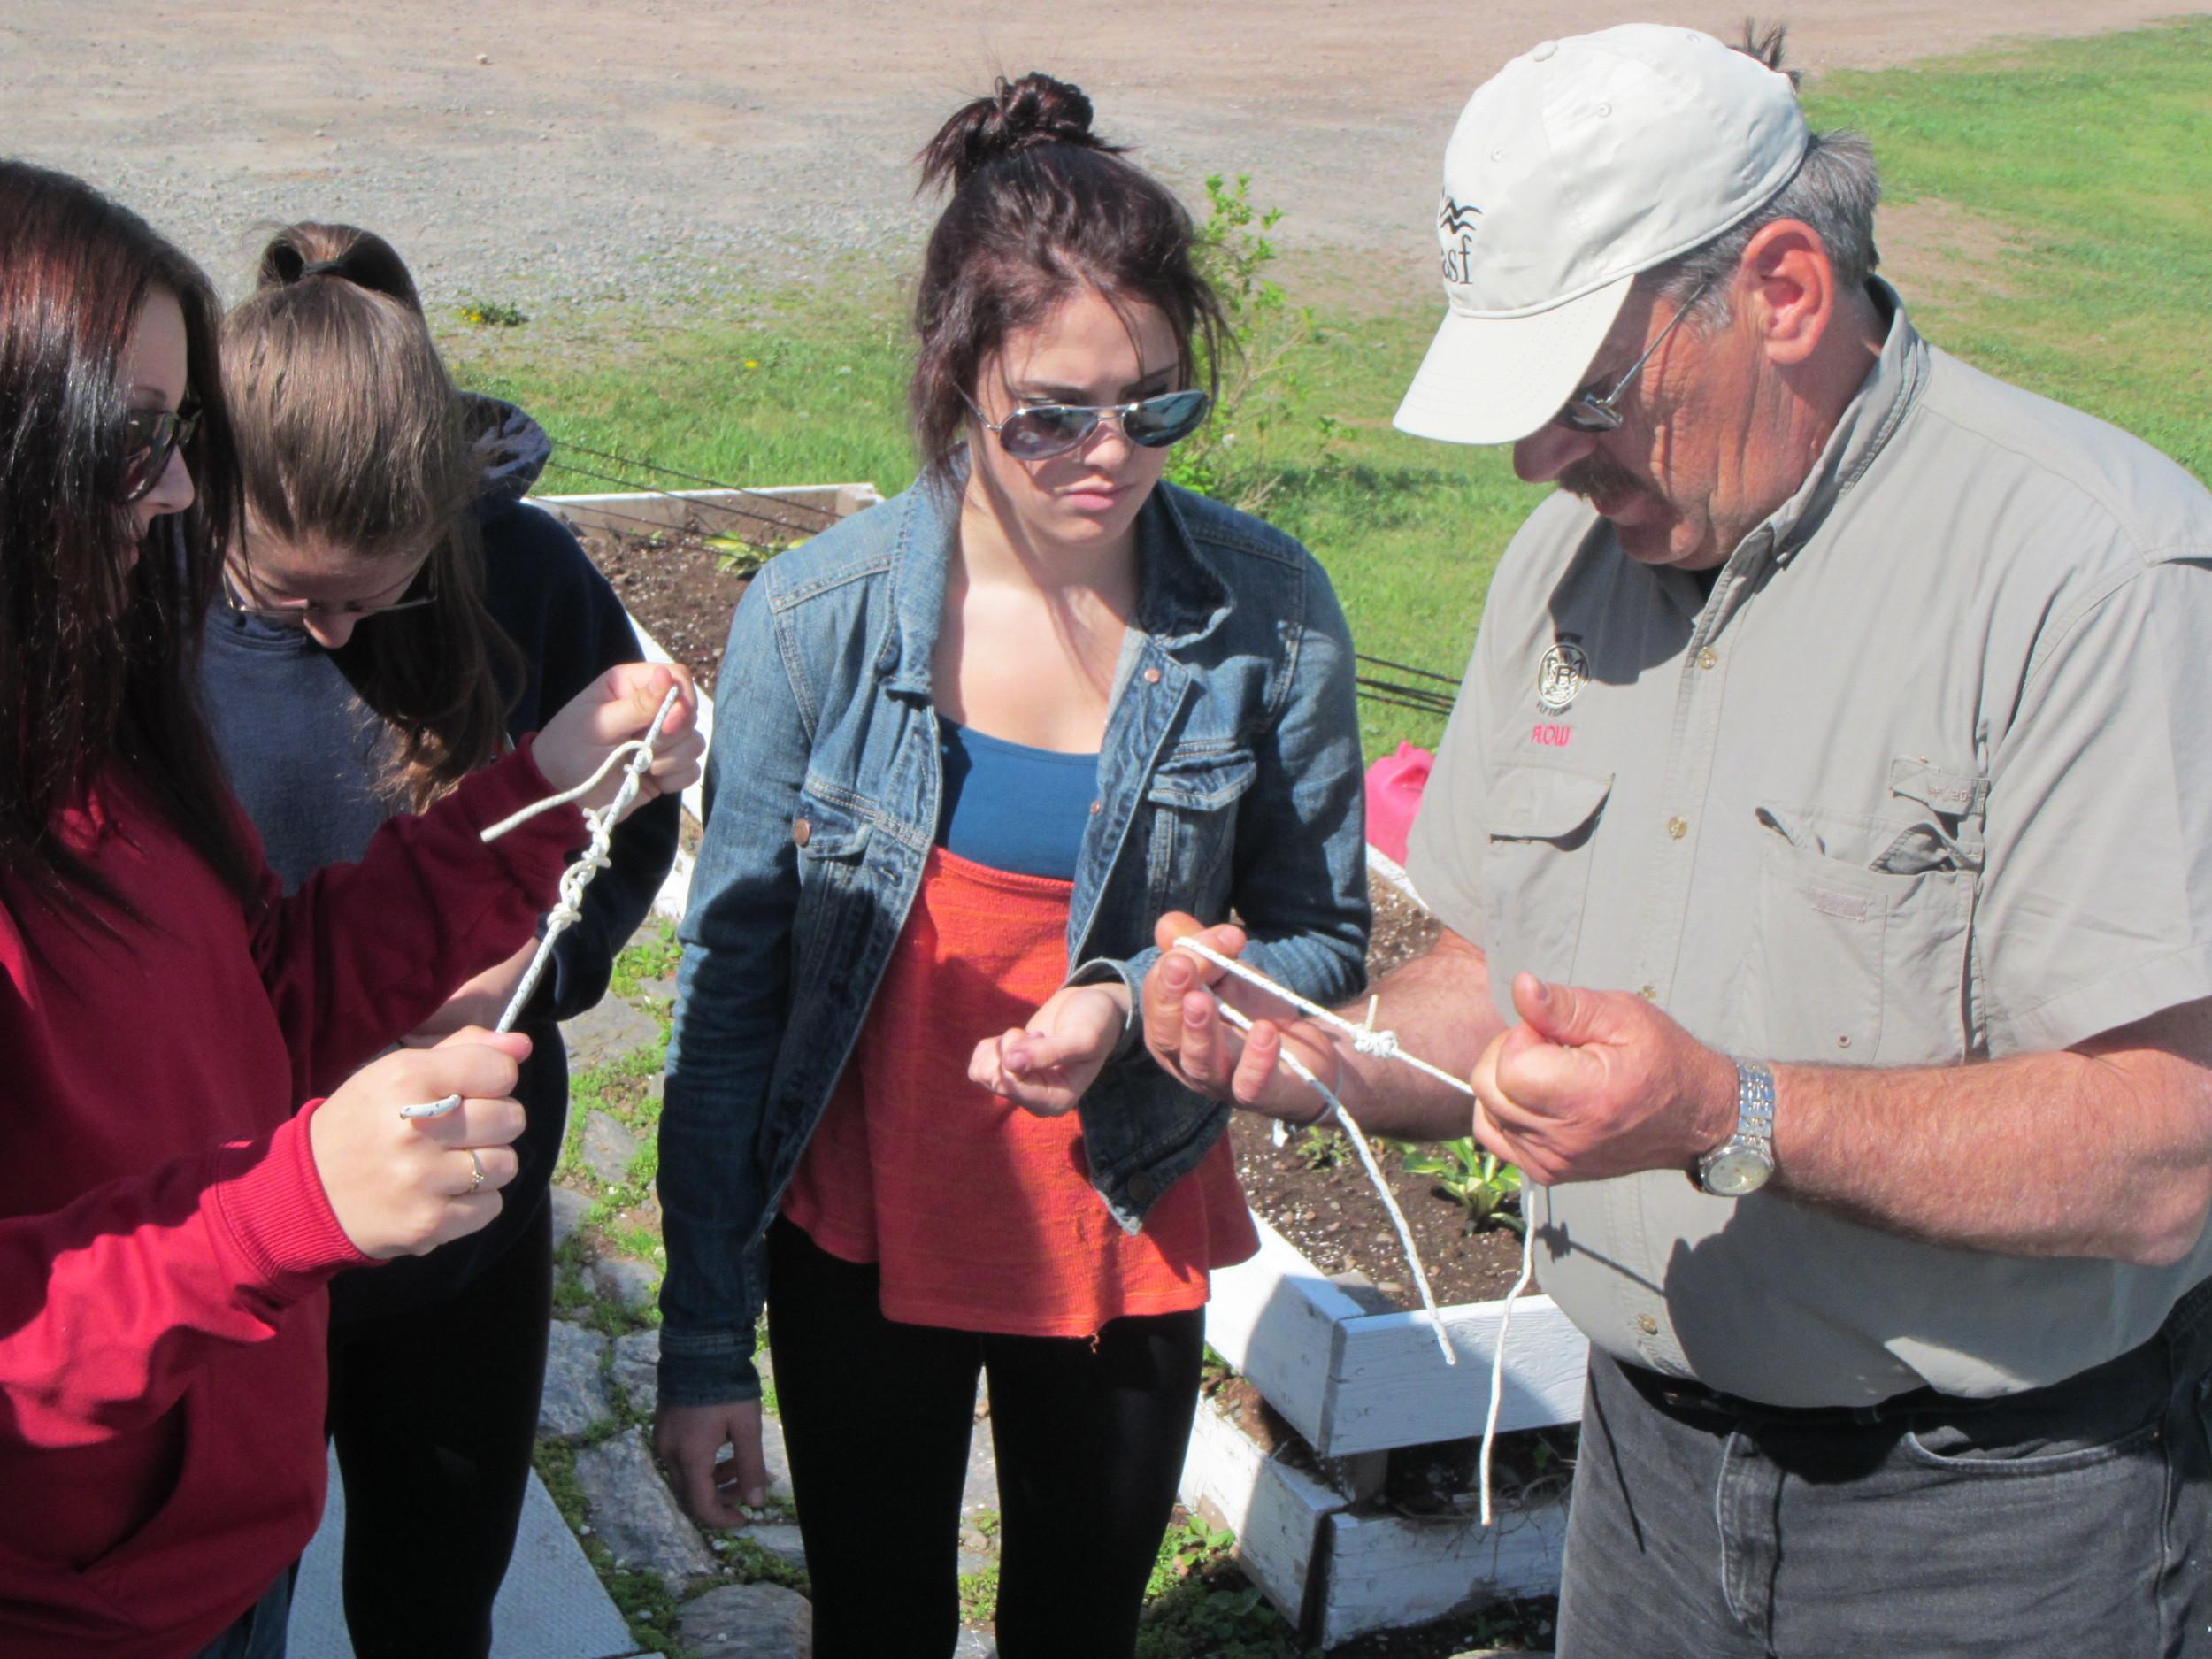 John Hart demonstrates how to tie basic knots.